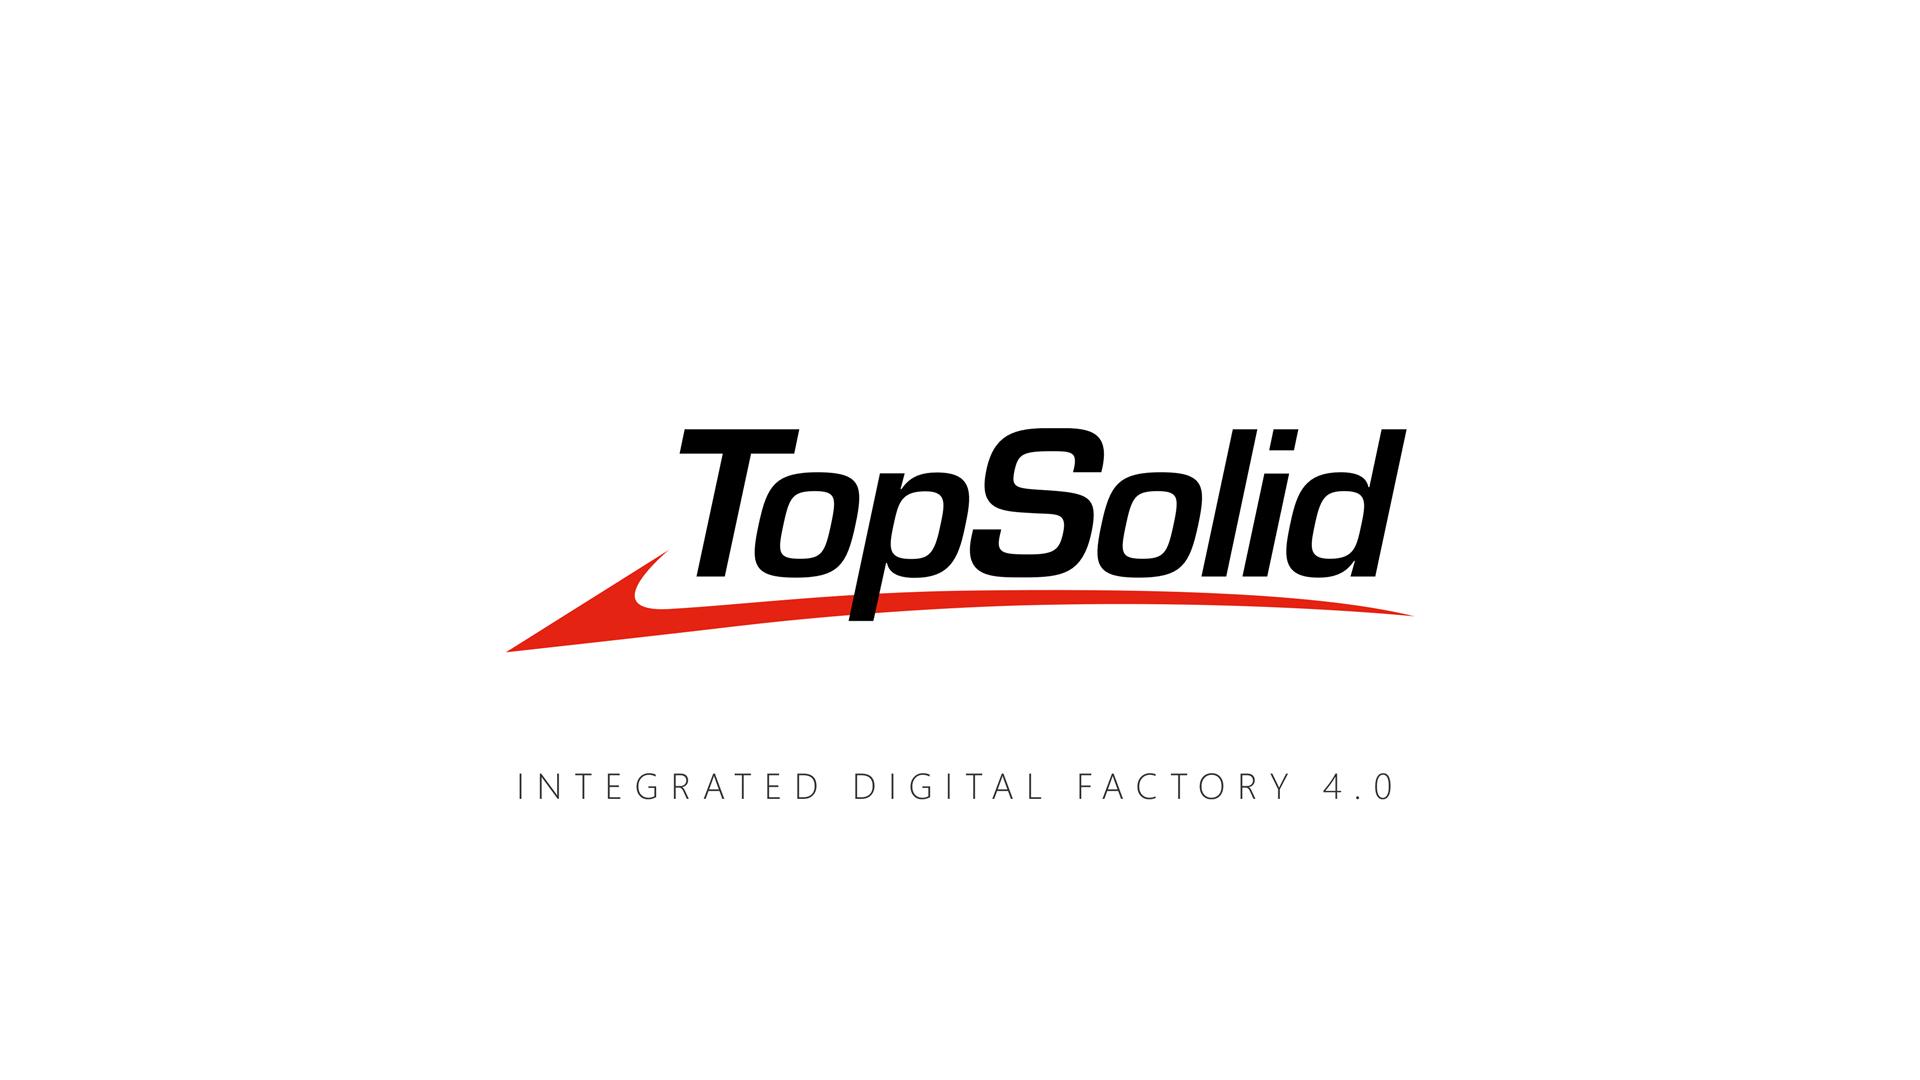 TopSolid'Digital Factory